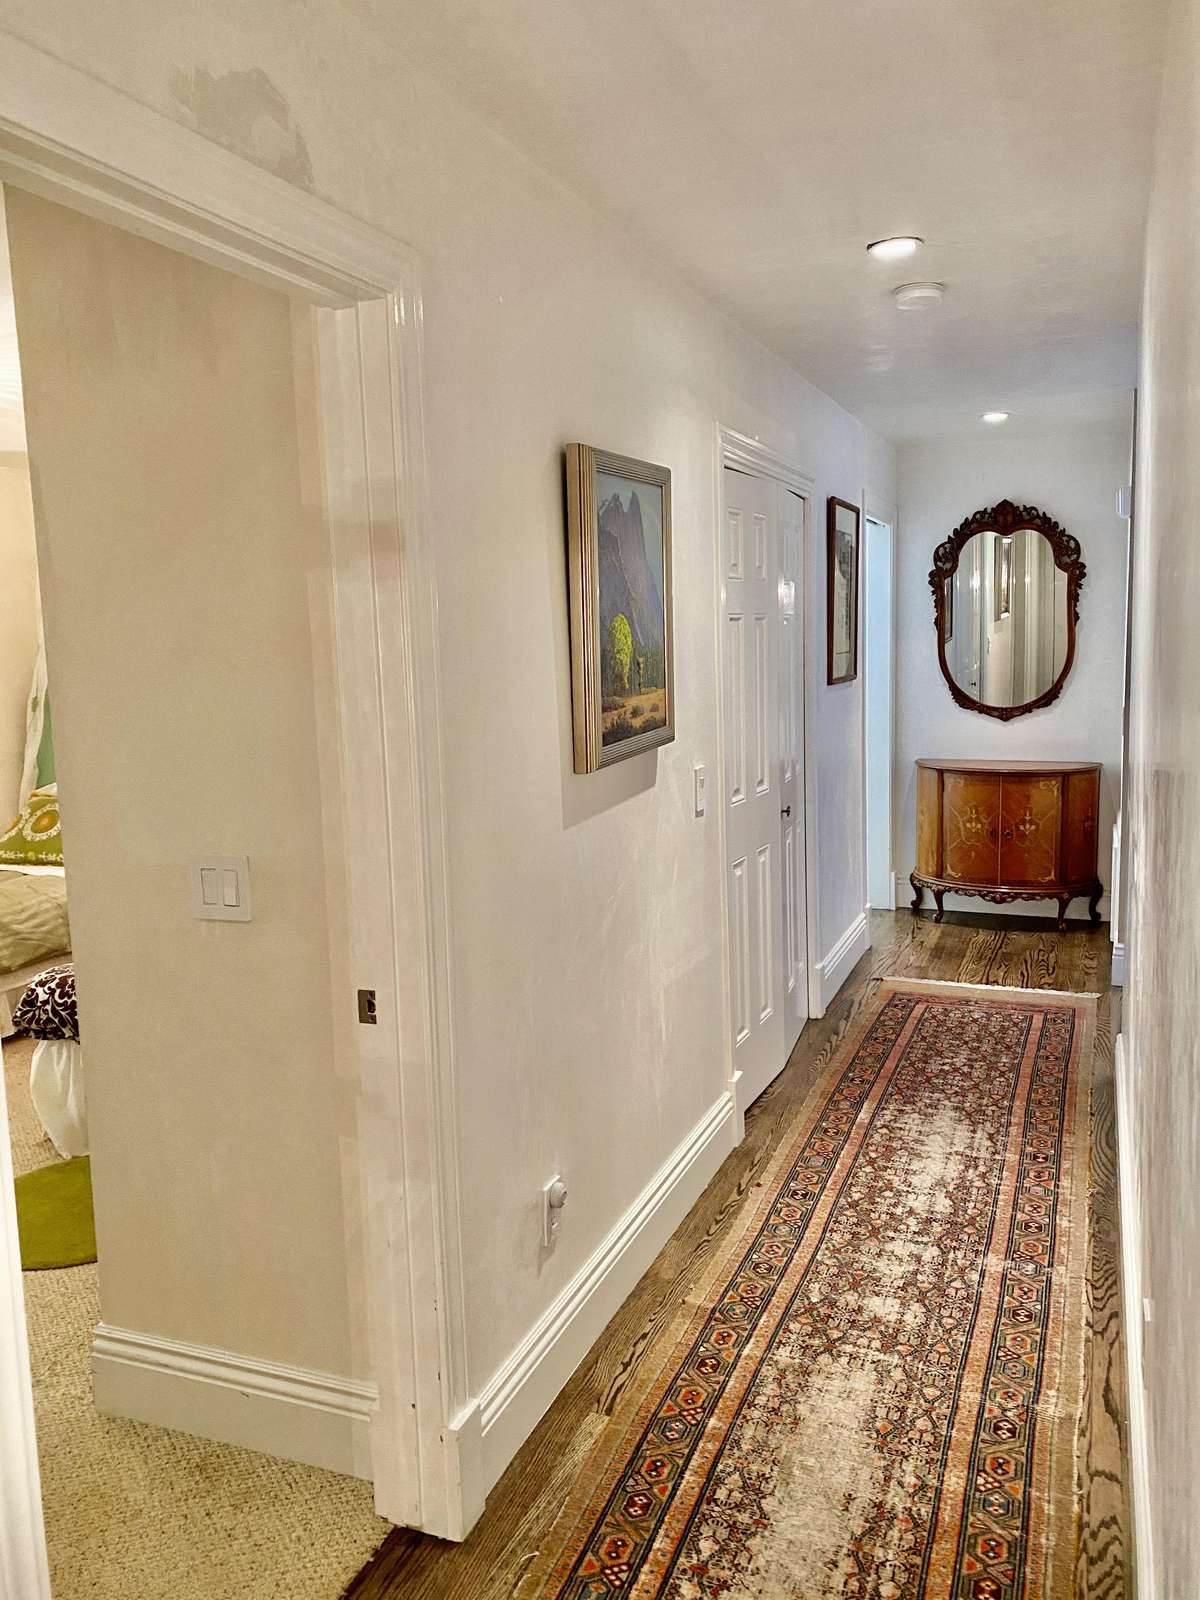 Main hallway looking toward kitchen from bedrooms 3 & 4